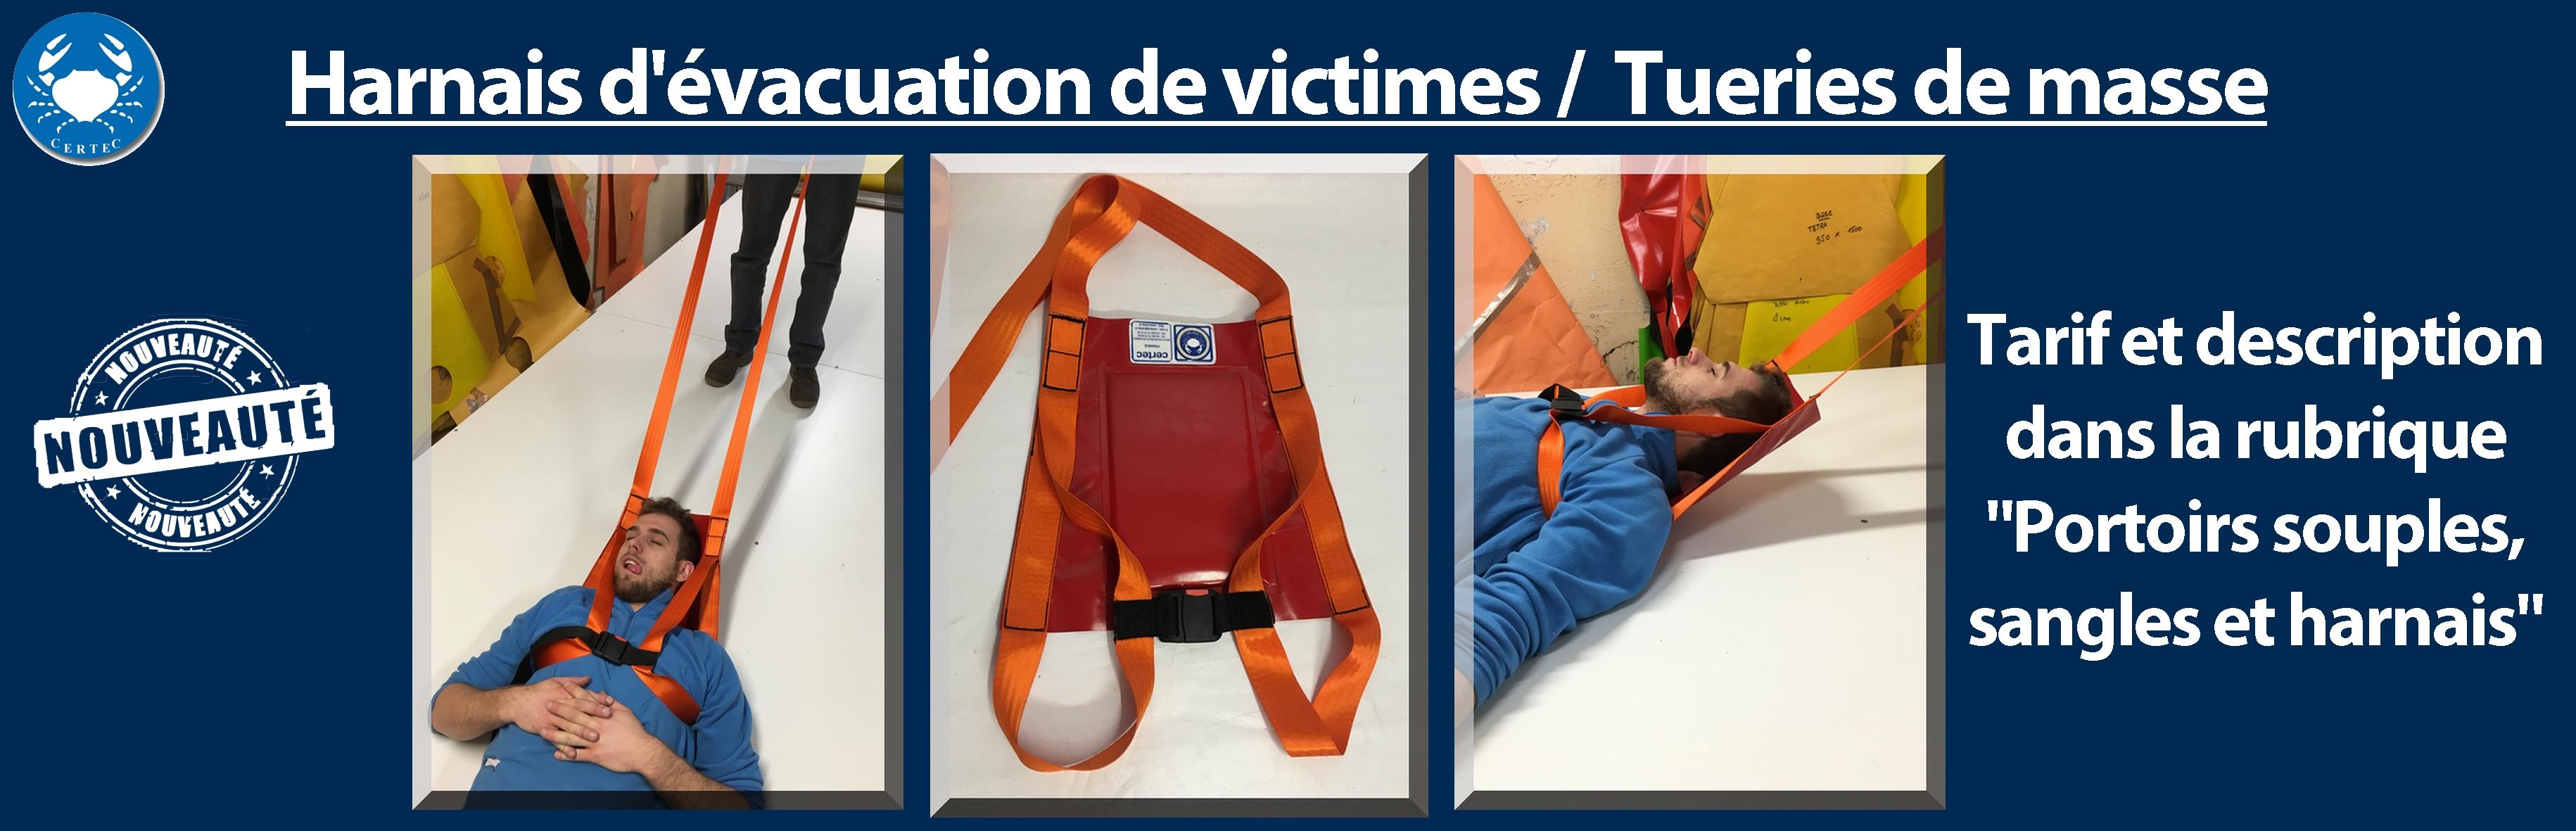 Bannire-harnais-vacuation-2